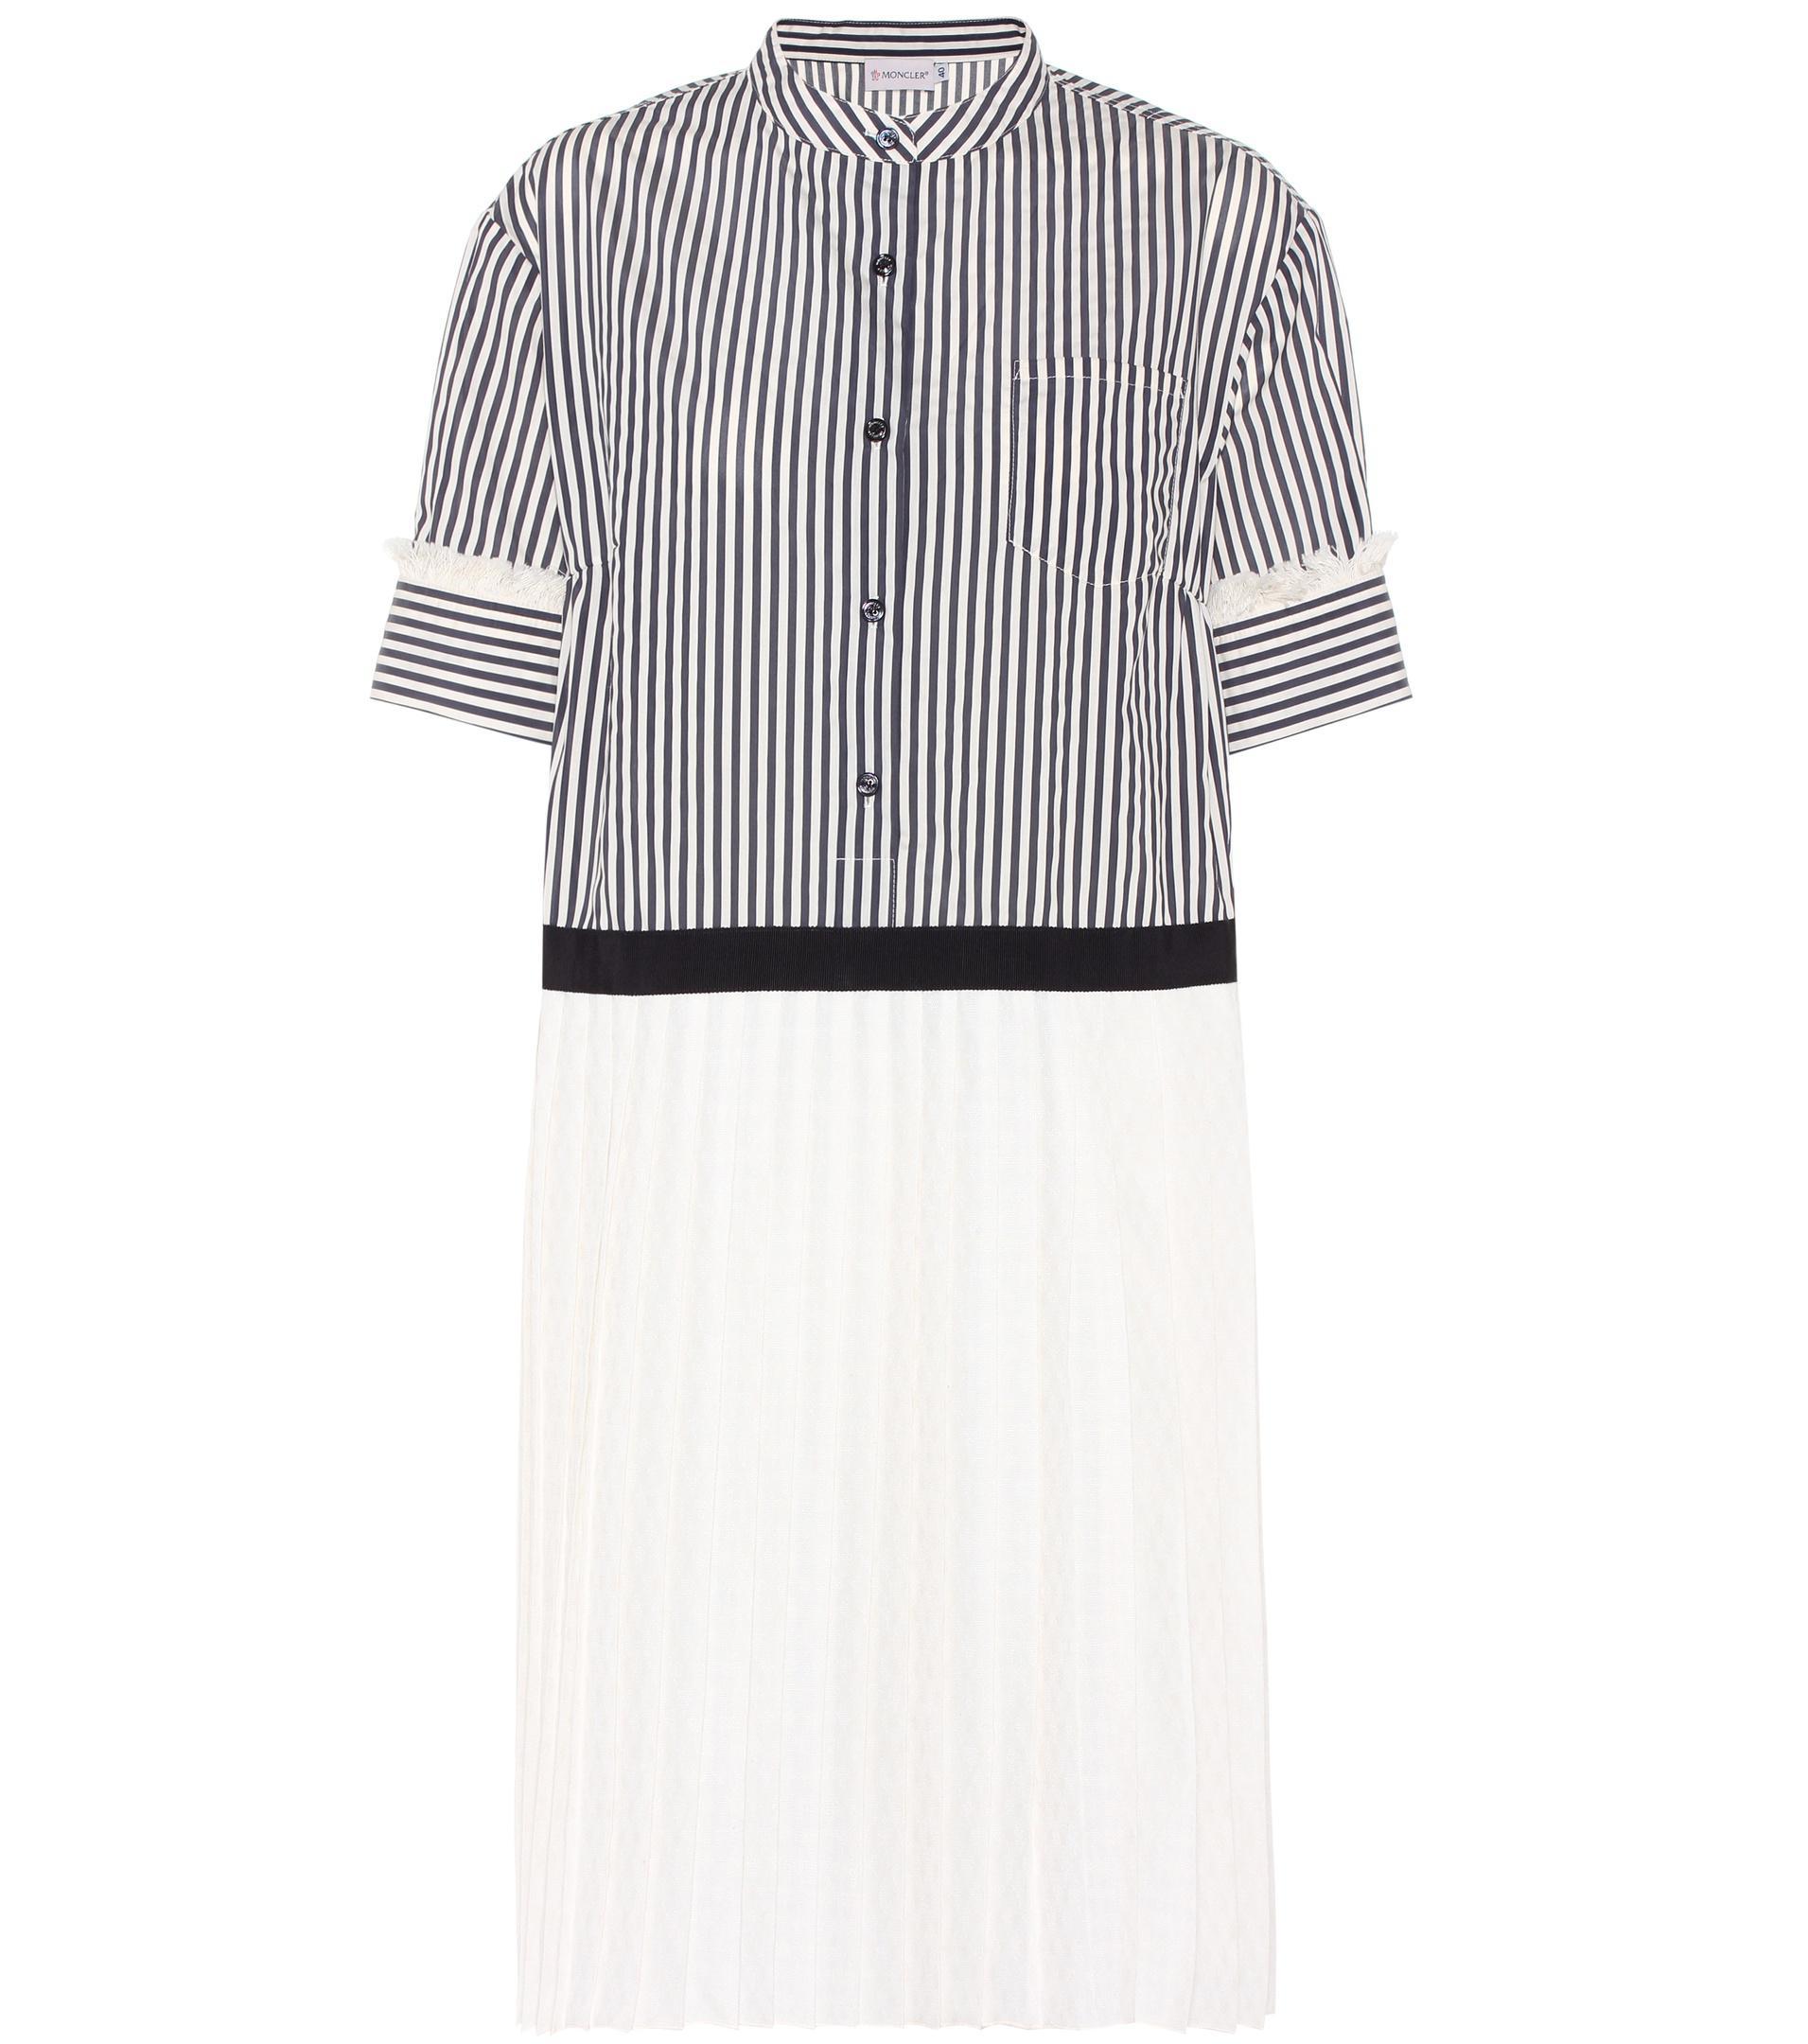 98d48f69567 Lyst - Moncler Striped Jacquard Dress in Blue